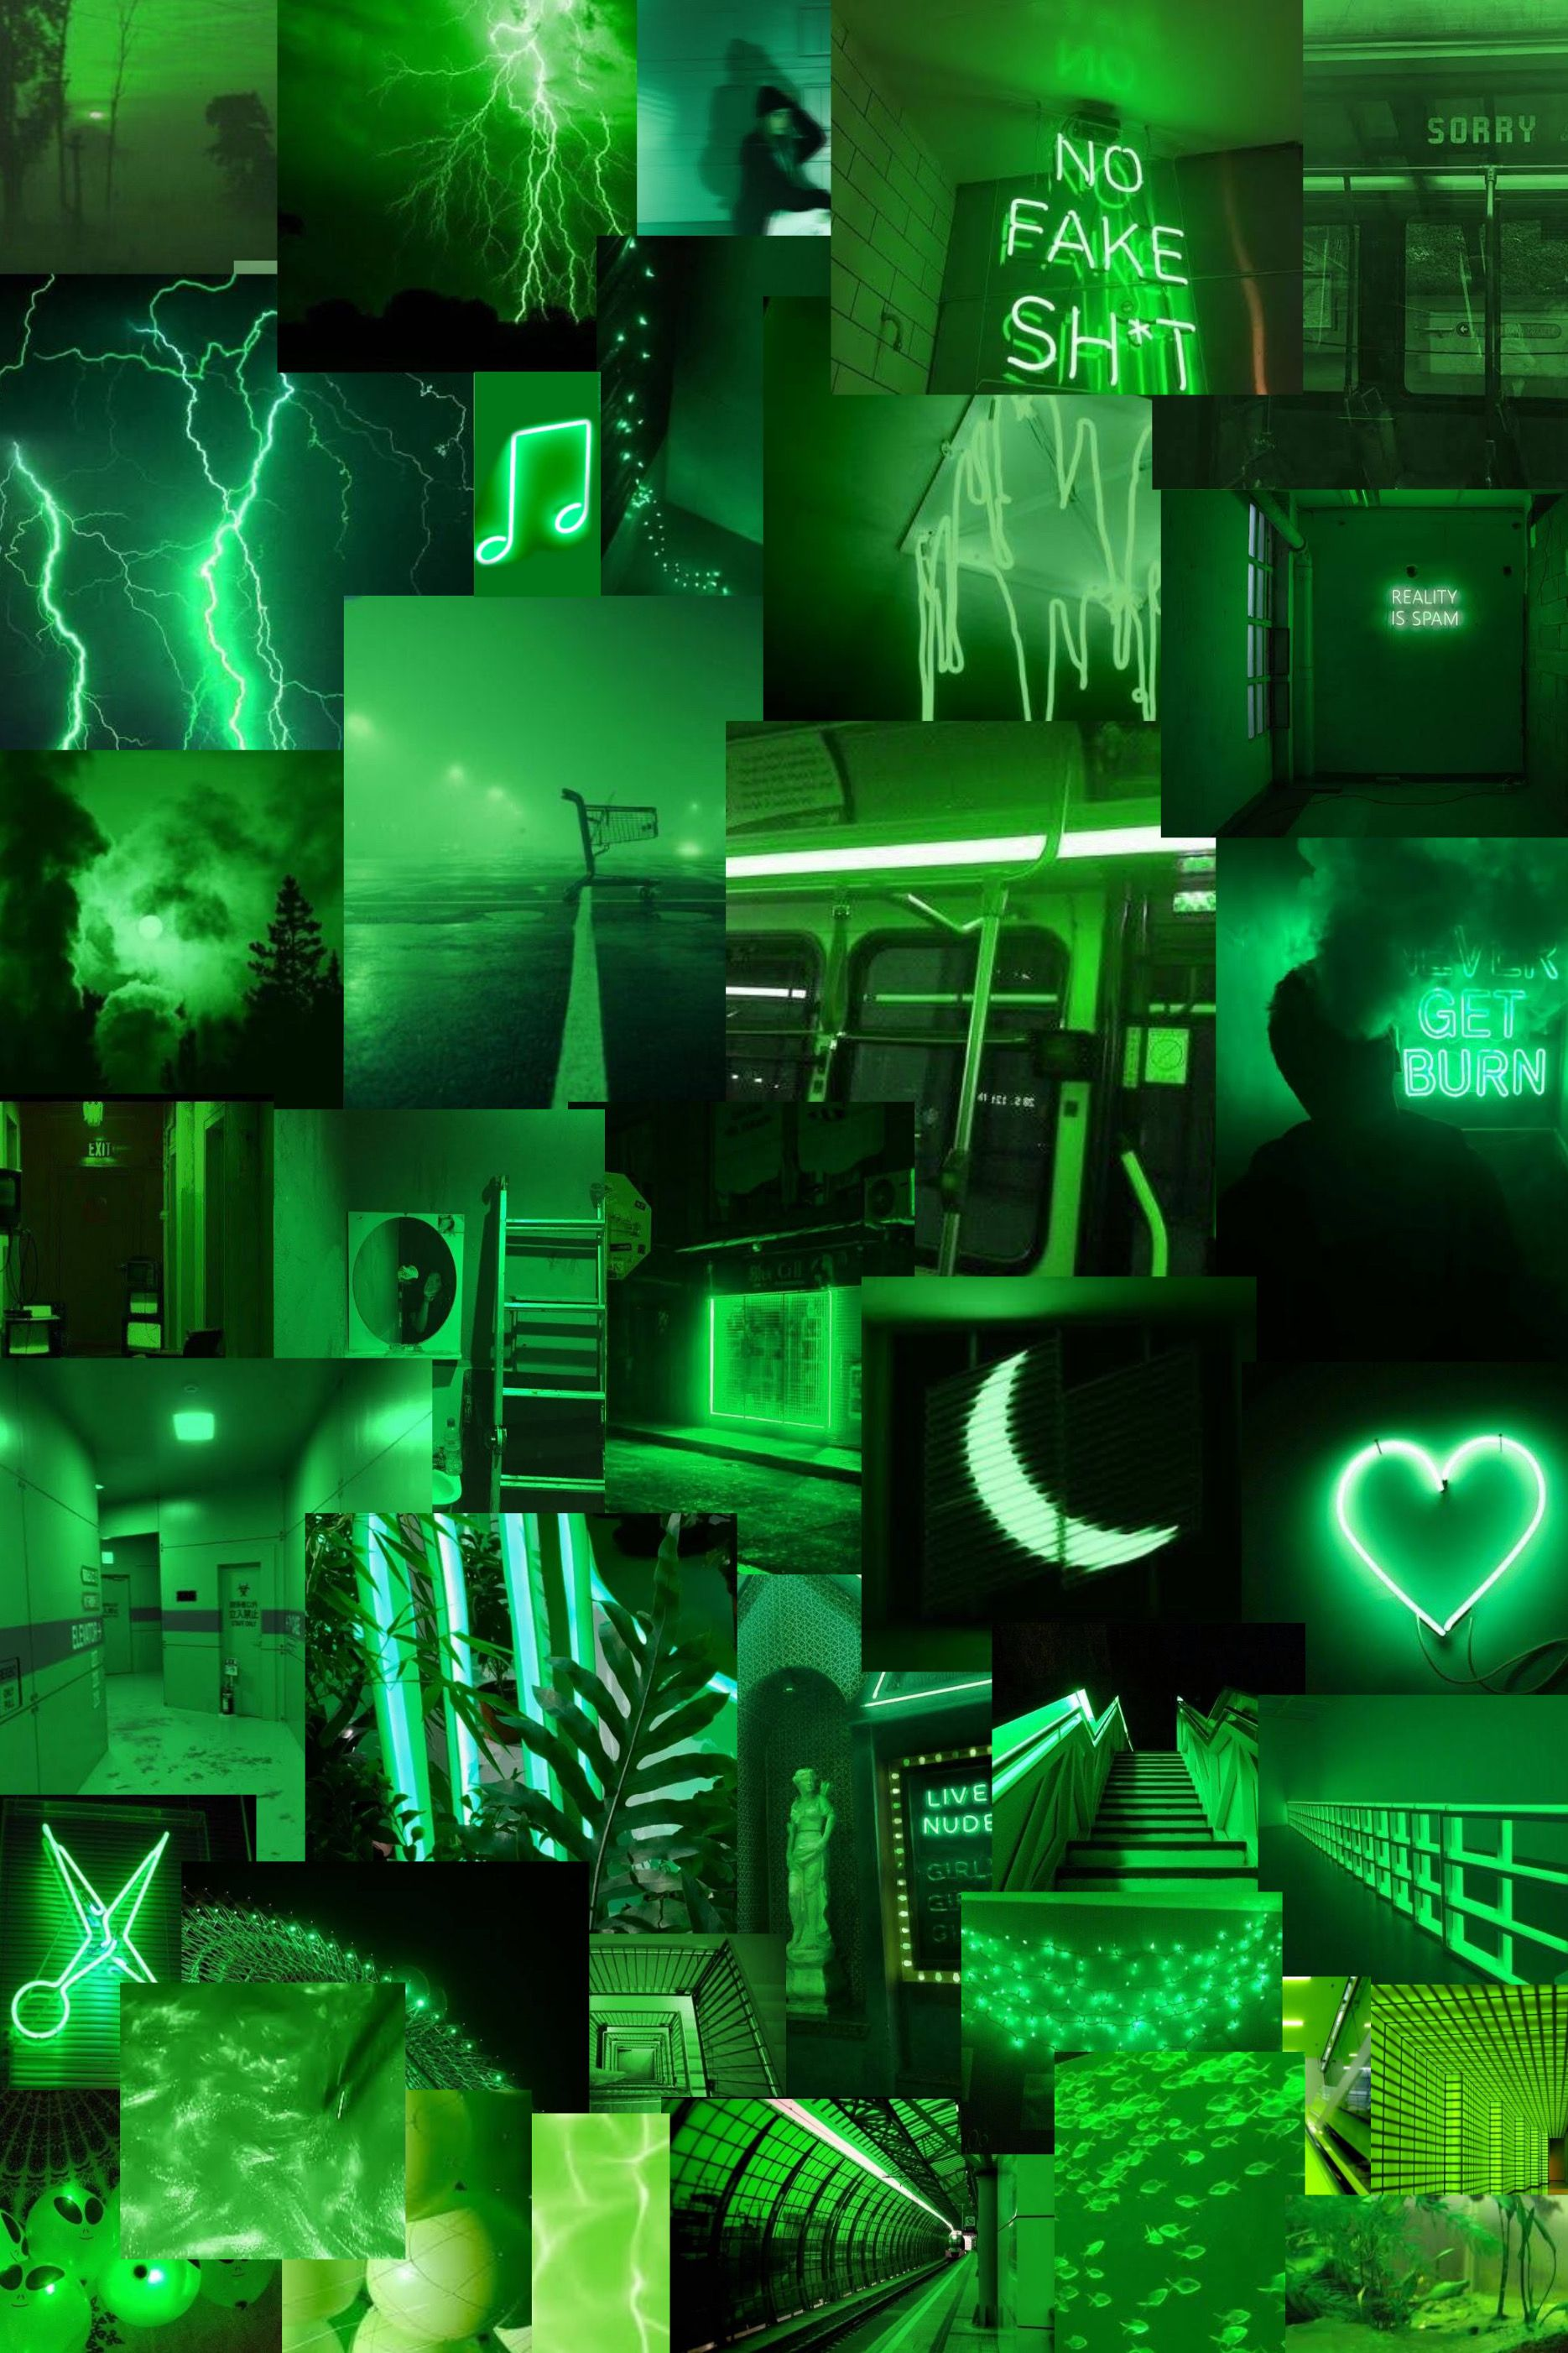 Green Aesthetic Wallpaper Iphone Wallpaper Green Green Aesthetic Dark Green Aesthetic